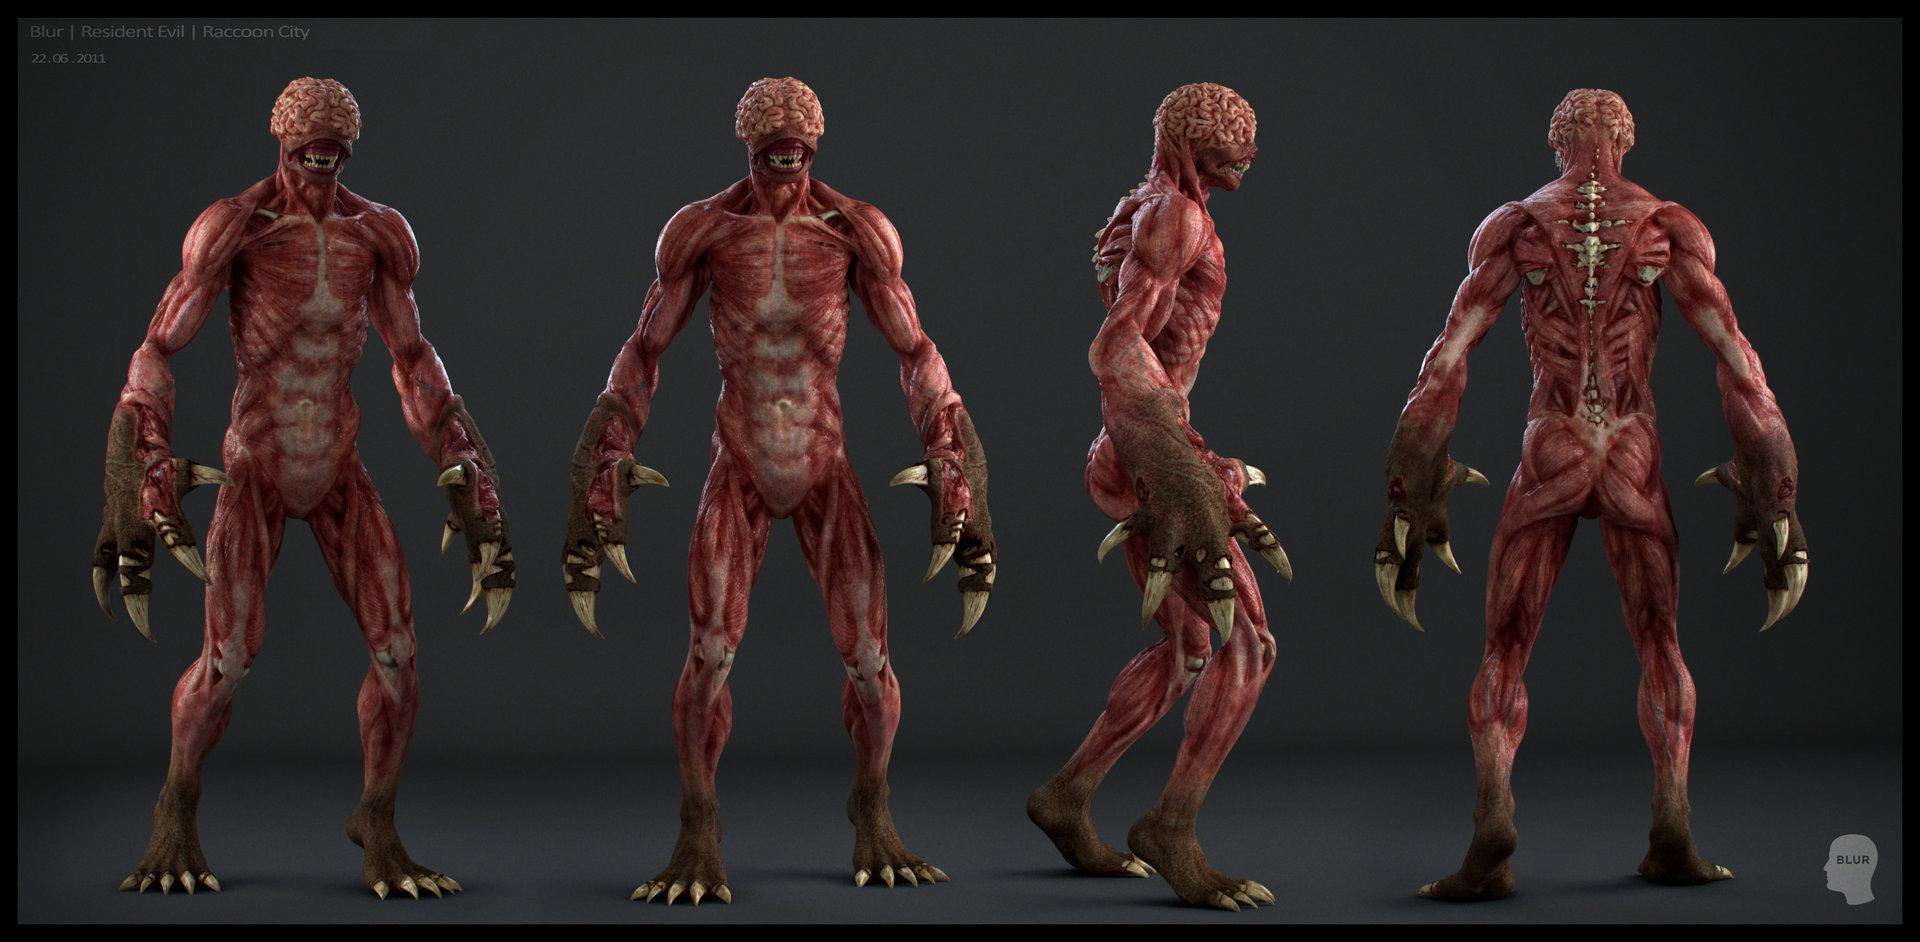 Nicolas Collings Resident Evil Blur Studio